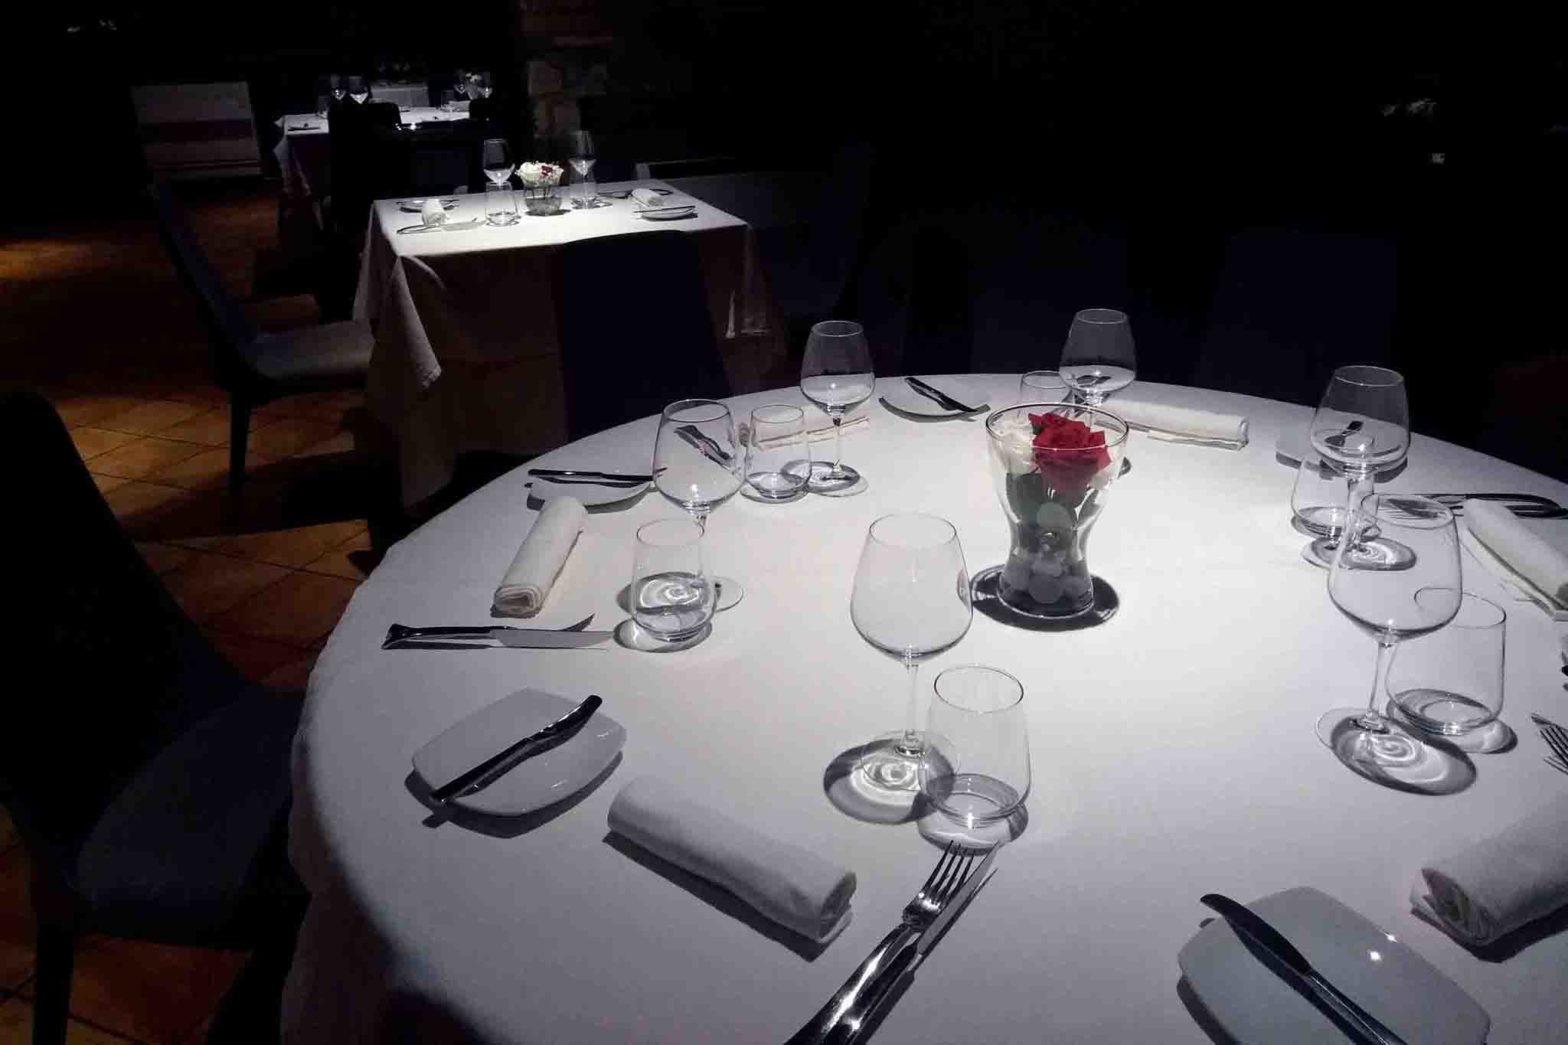 tavolo ristorante cena ristoratori